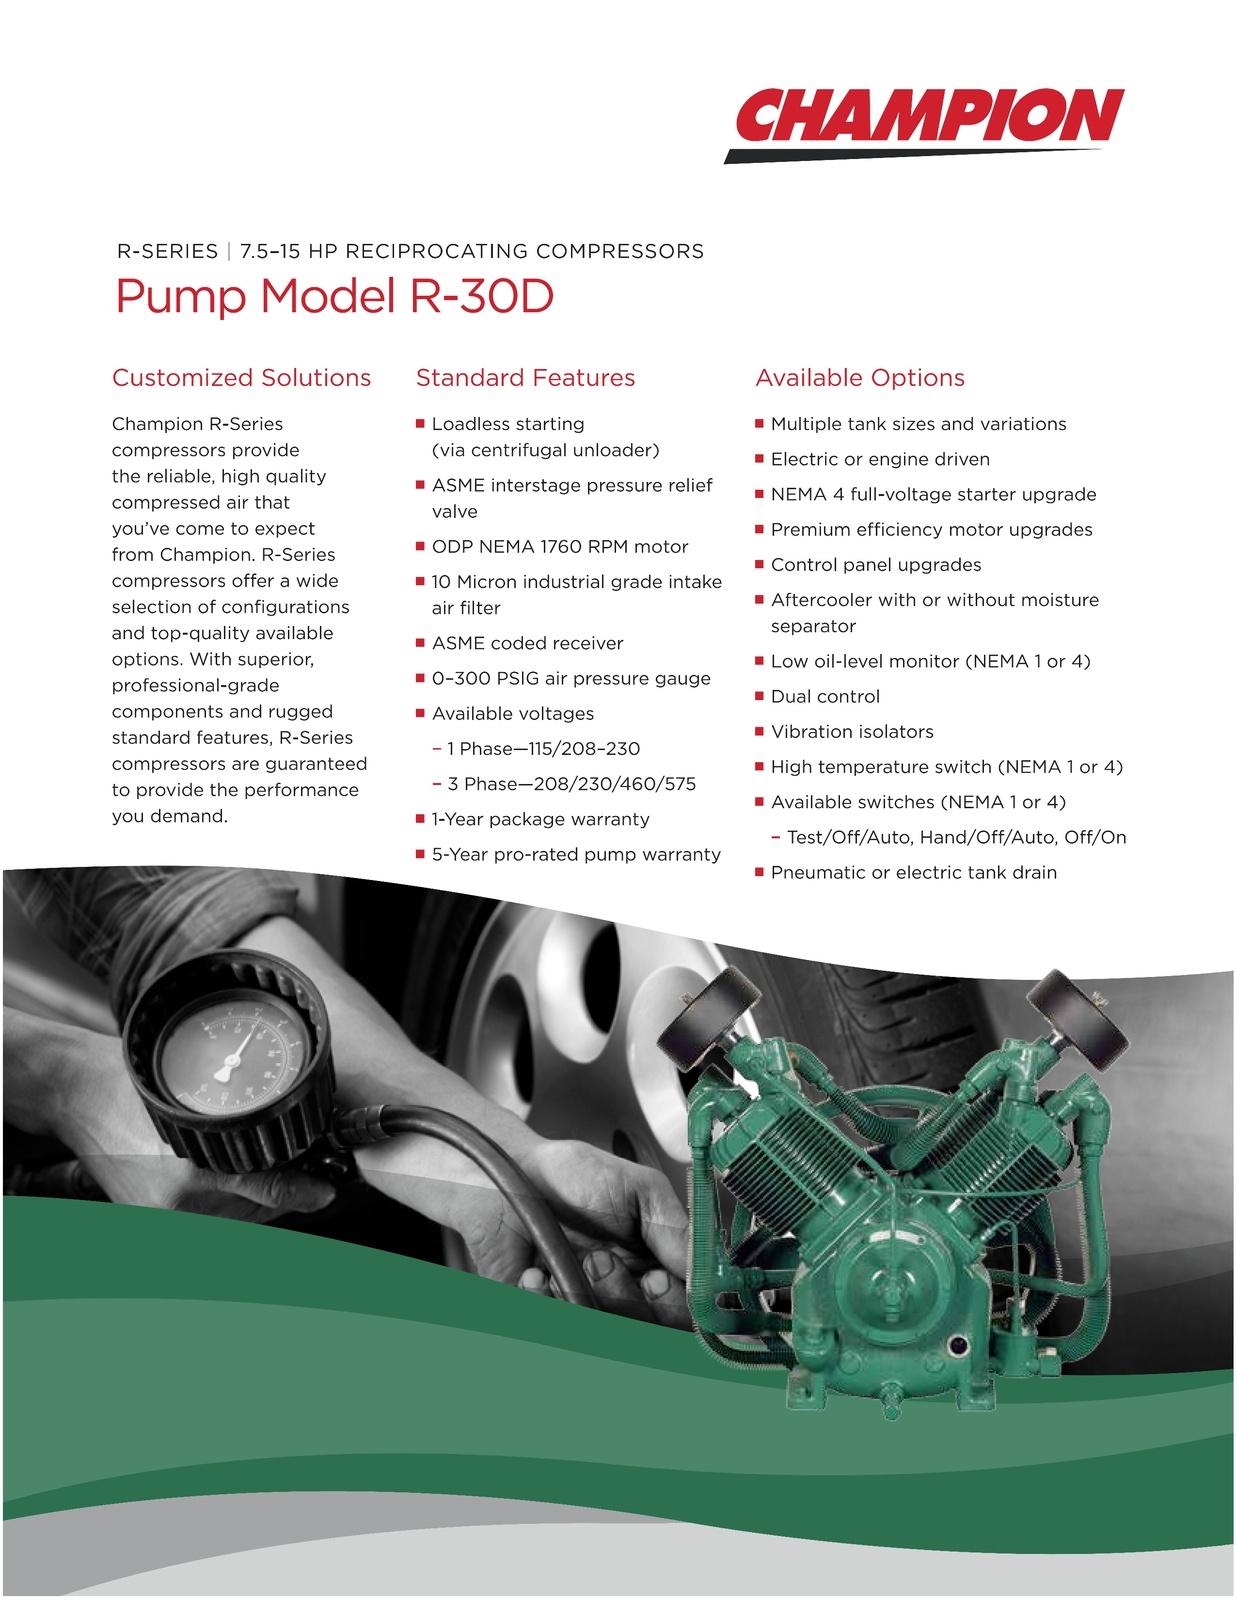 Details about Champion R30 Compressor Pump 7.5-15Hp w/ Head ...